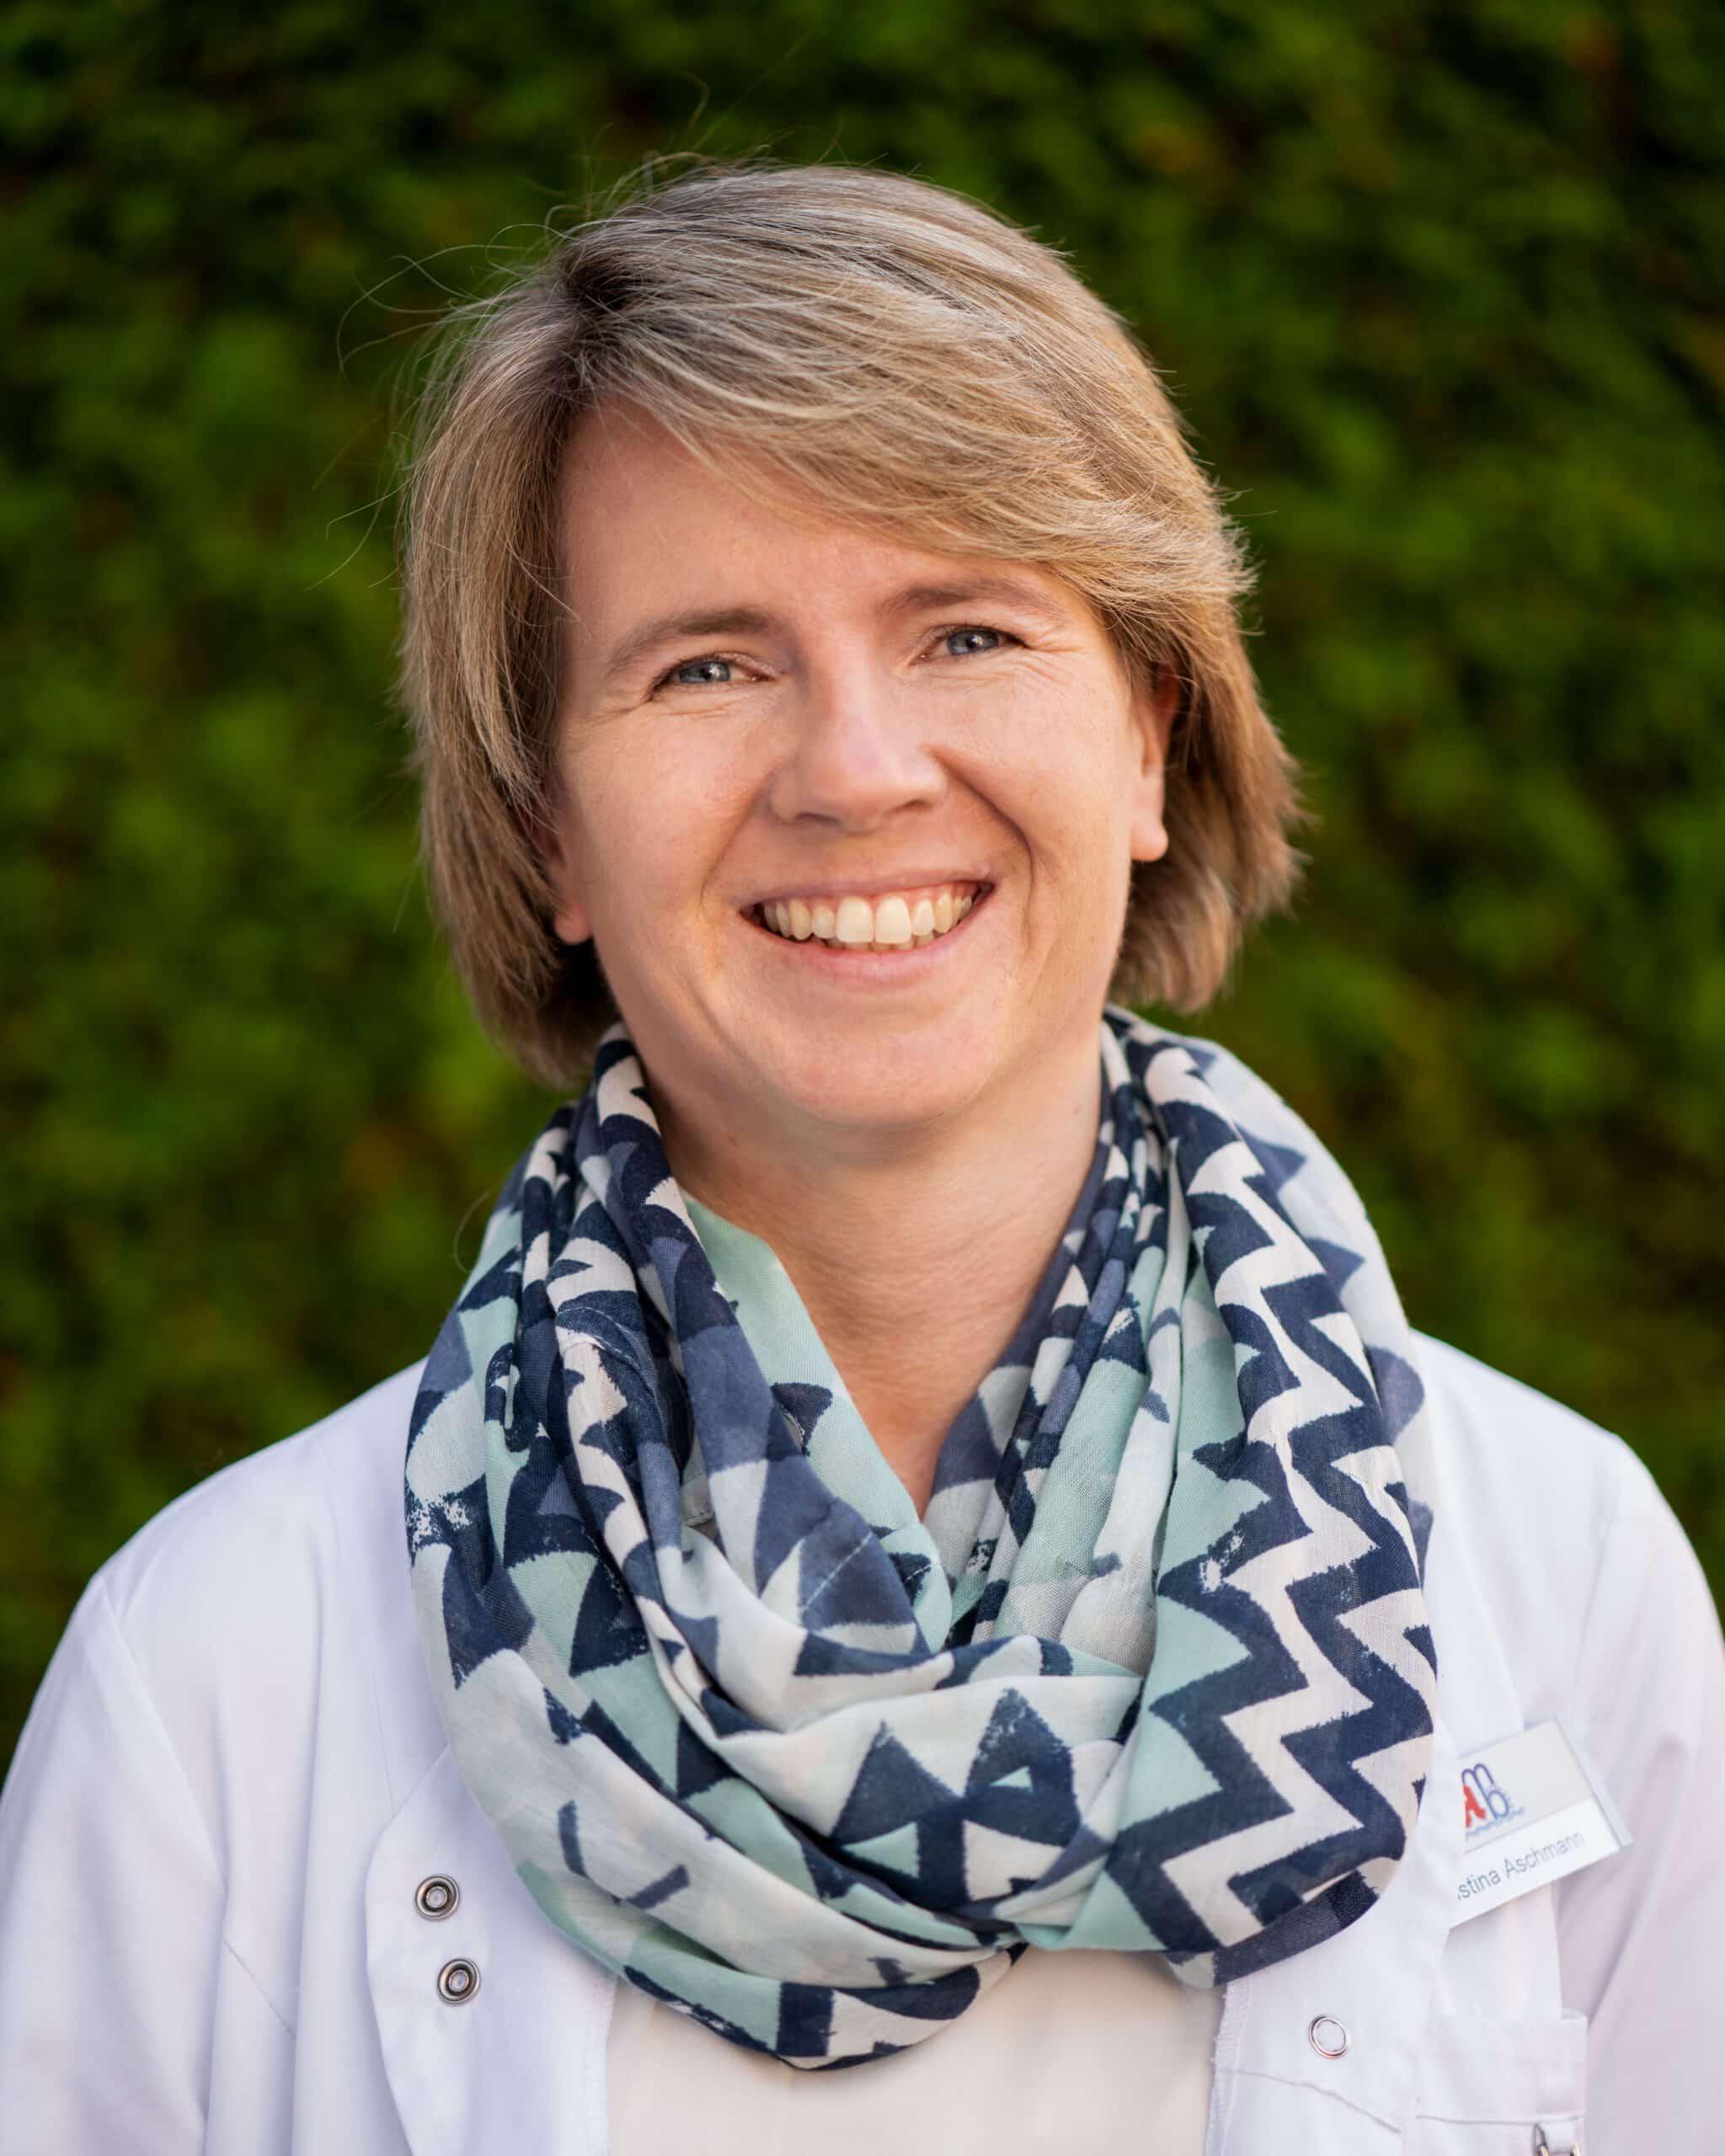 Frau Christina Aschmann (PTA)